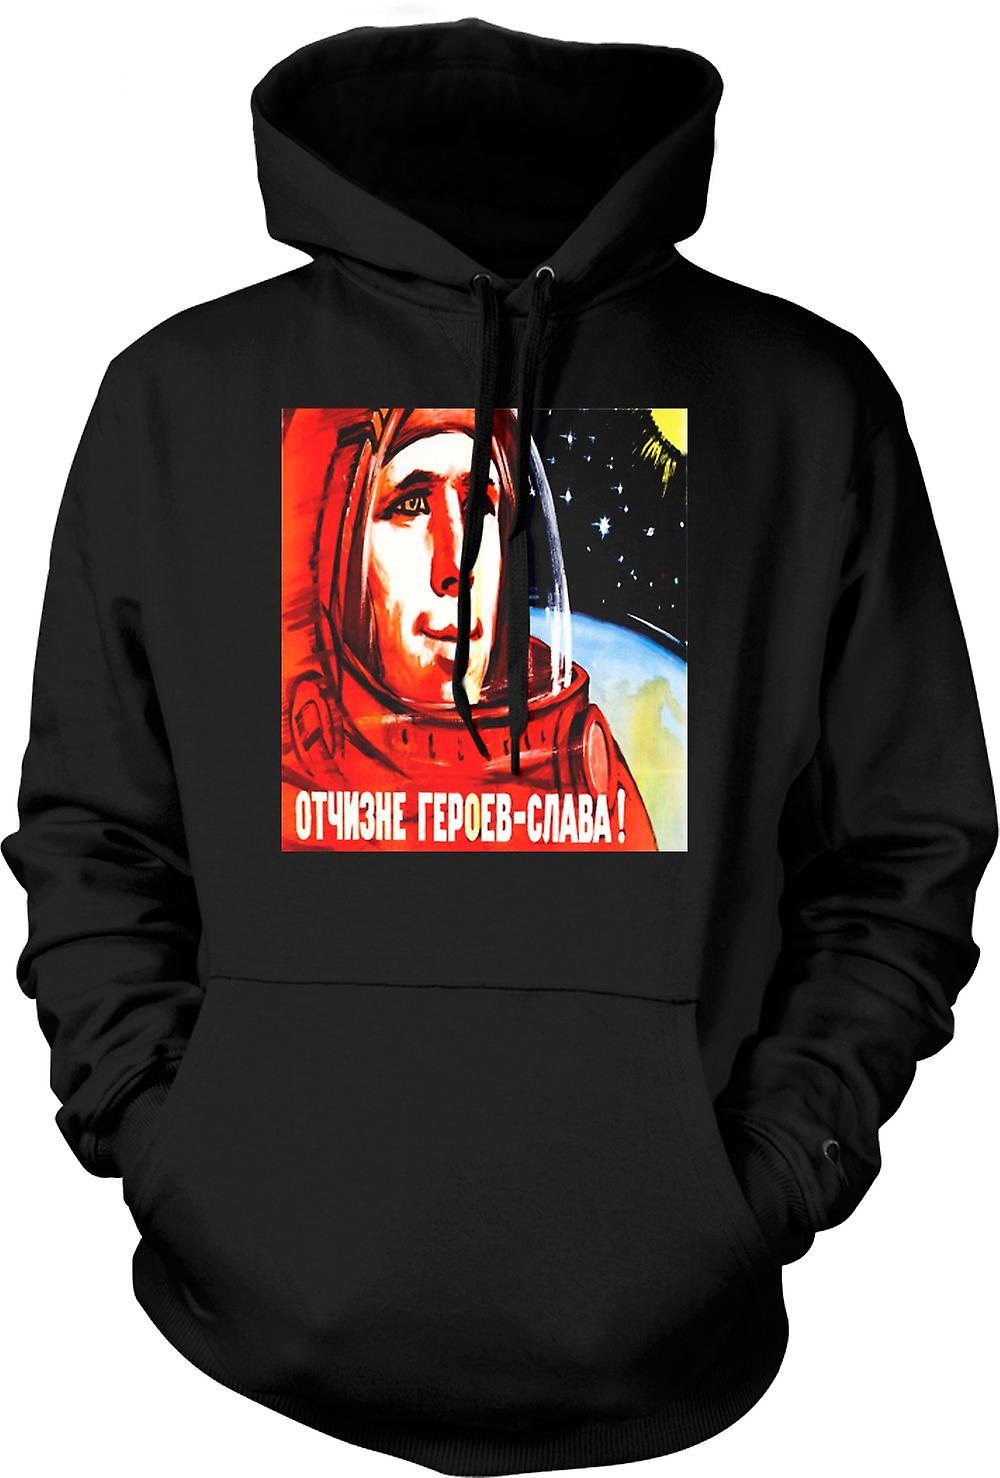 Para hombre con capucha - Yuri Gagarin - cosmonauta ruso